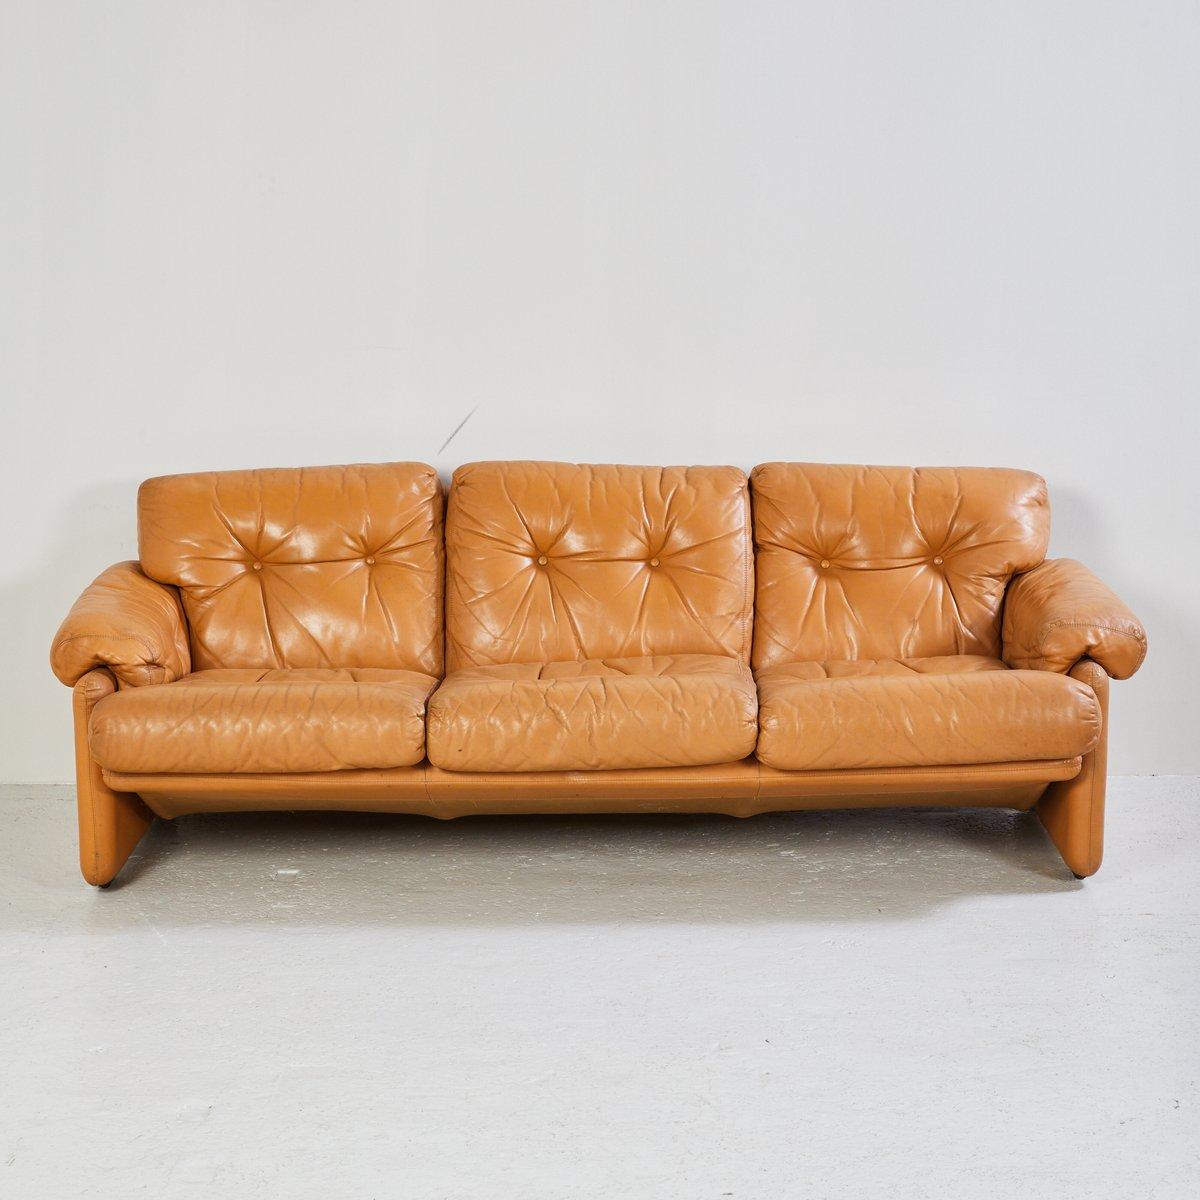 coronado sofa set von afra und tobia scarpa f r b b italia bei pamono kaufen. Black Bedroom Furniture Sets. Home Design Ideas